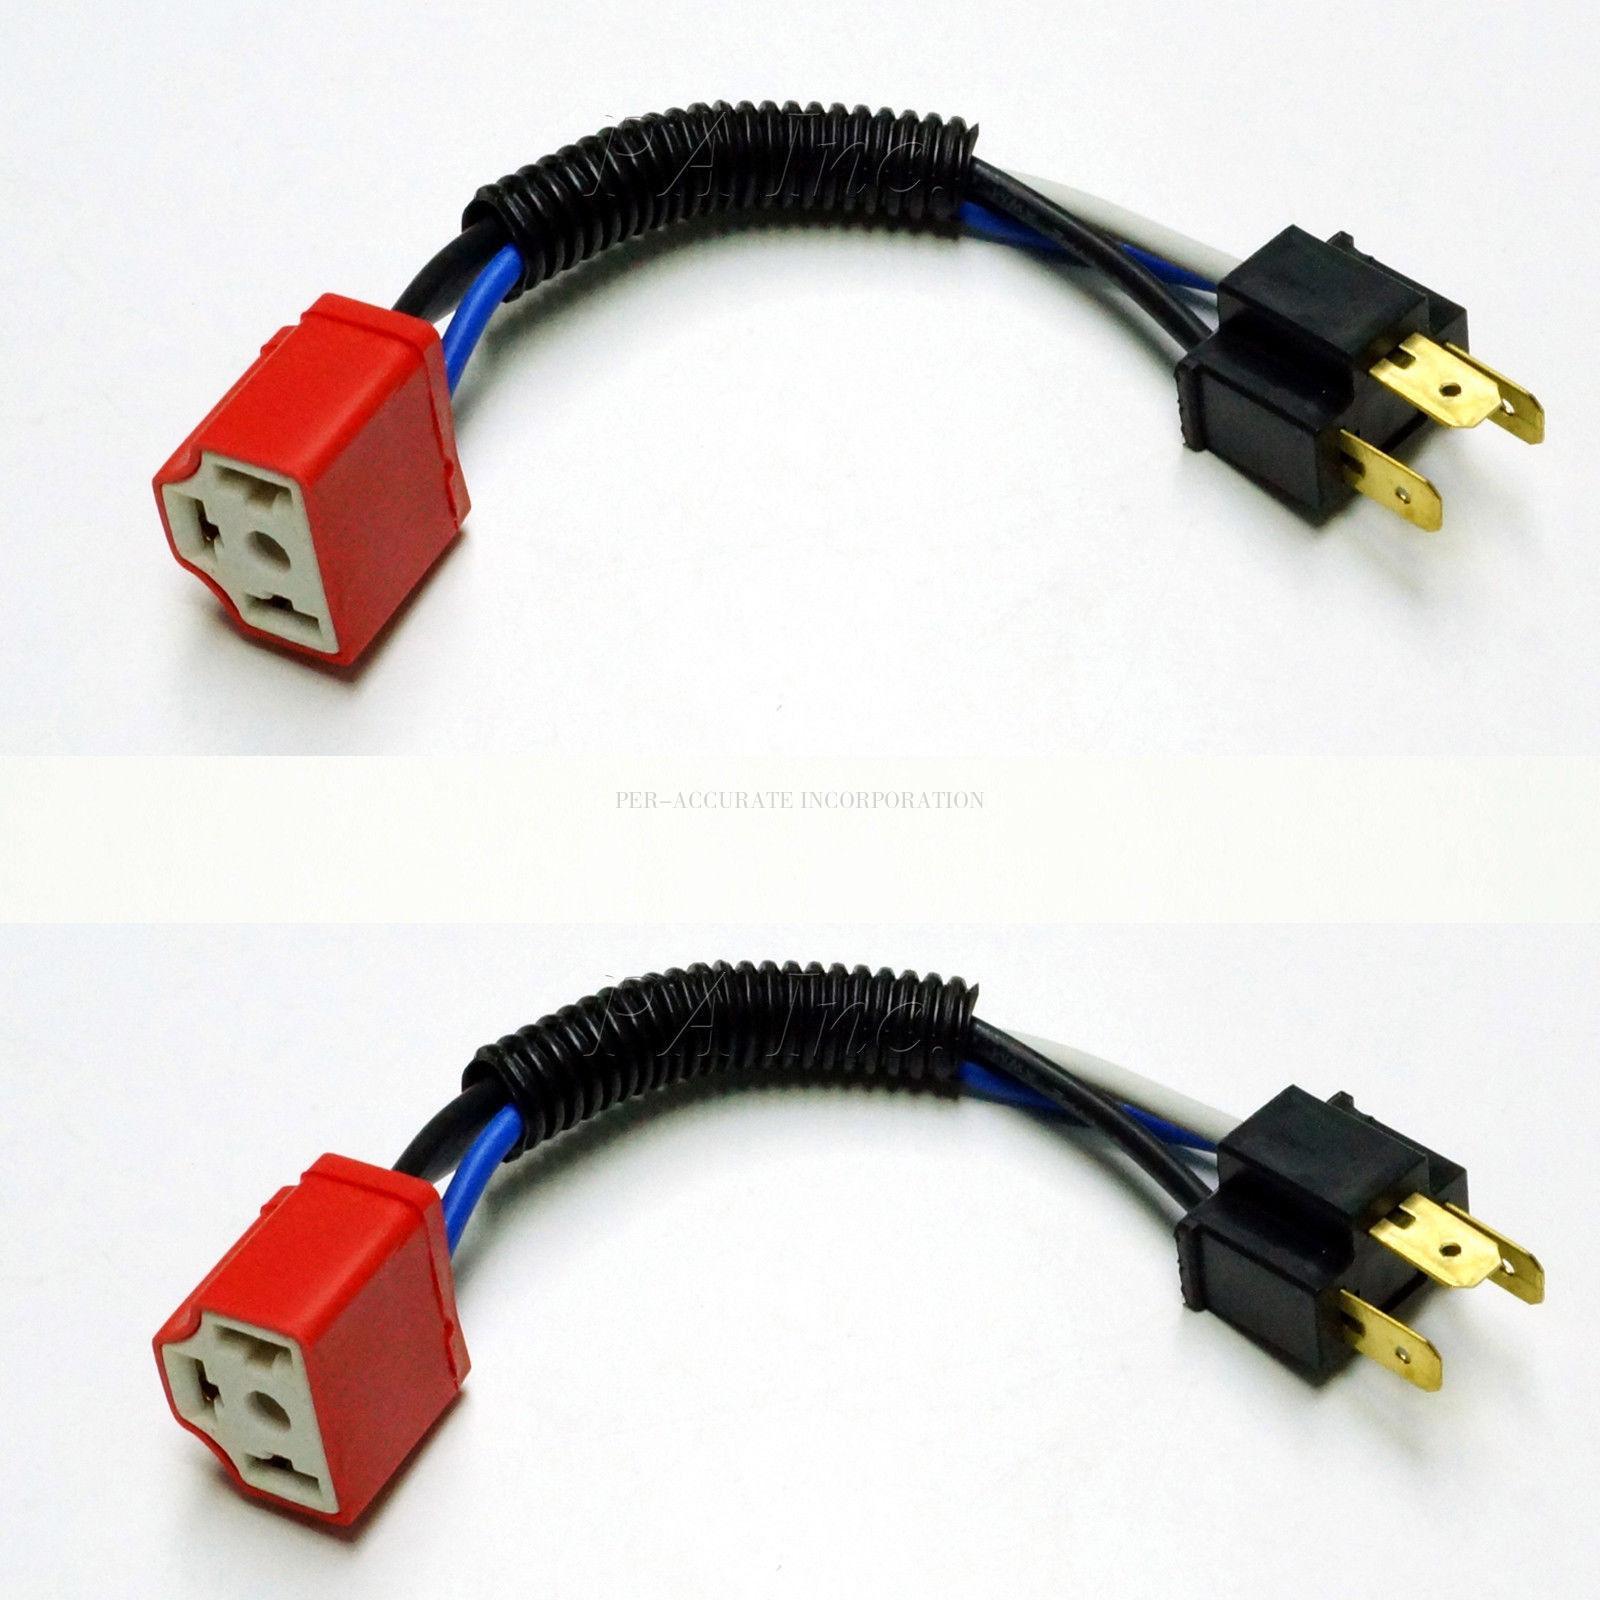 hight resolution of taiwan 4pcs ceramic wire harness h4 headlight plug n play bulb socket taiwantrade